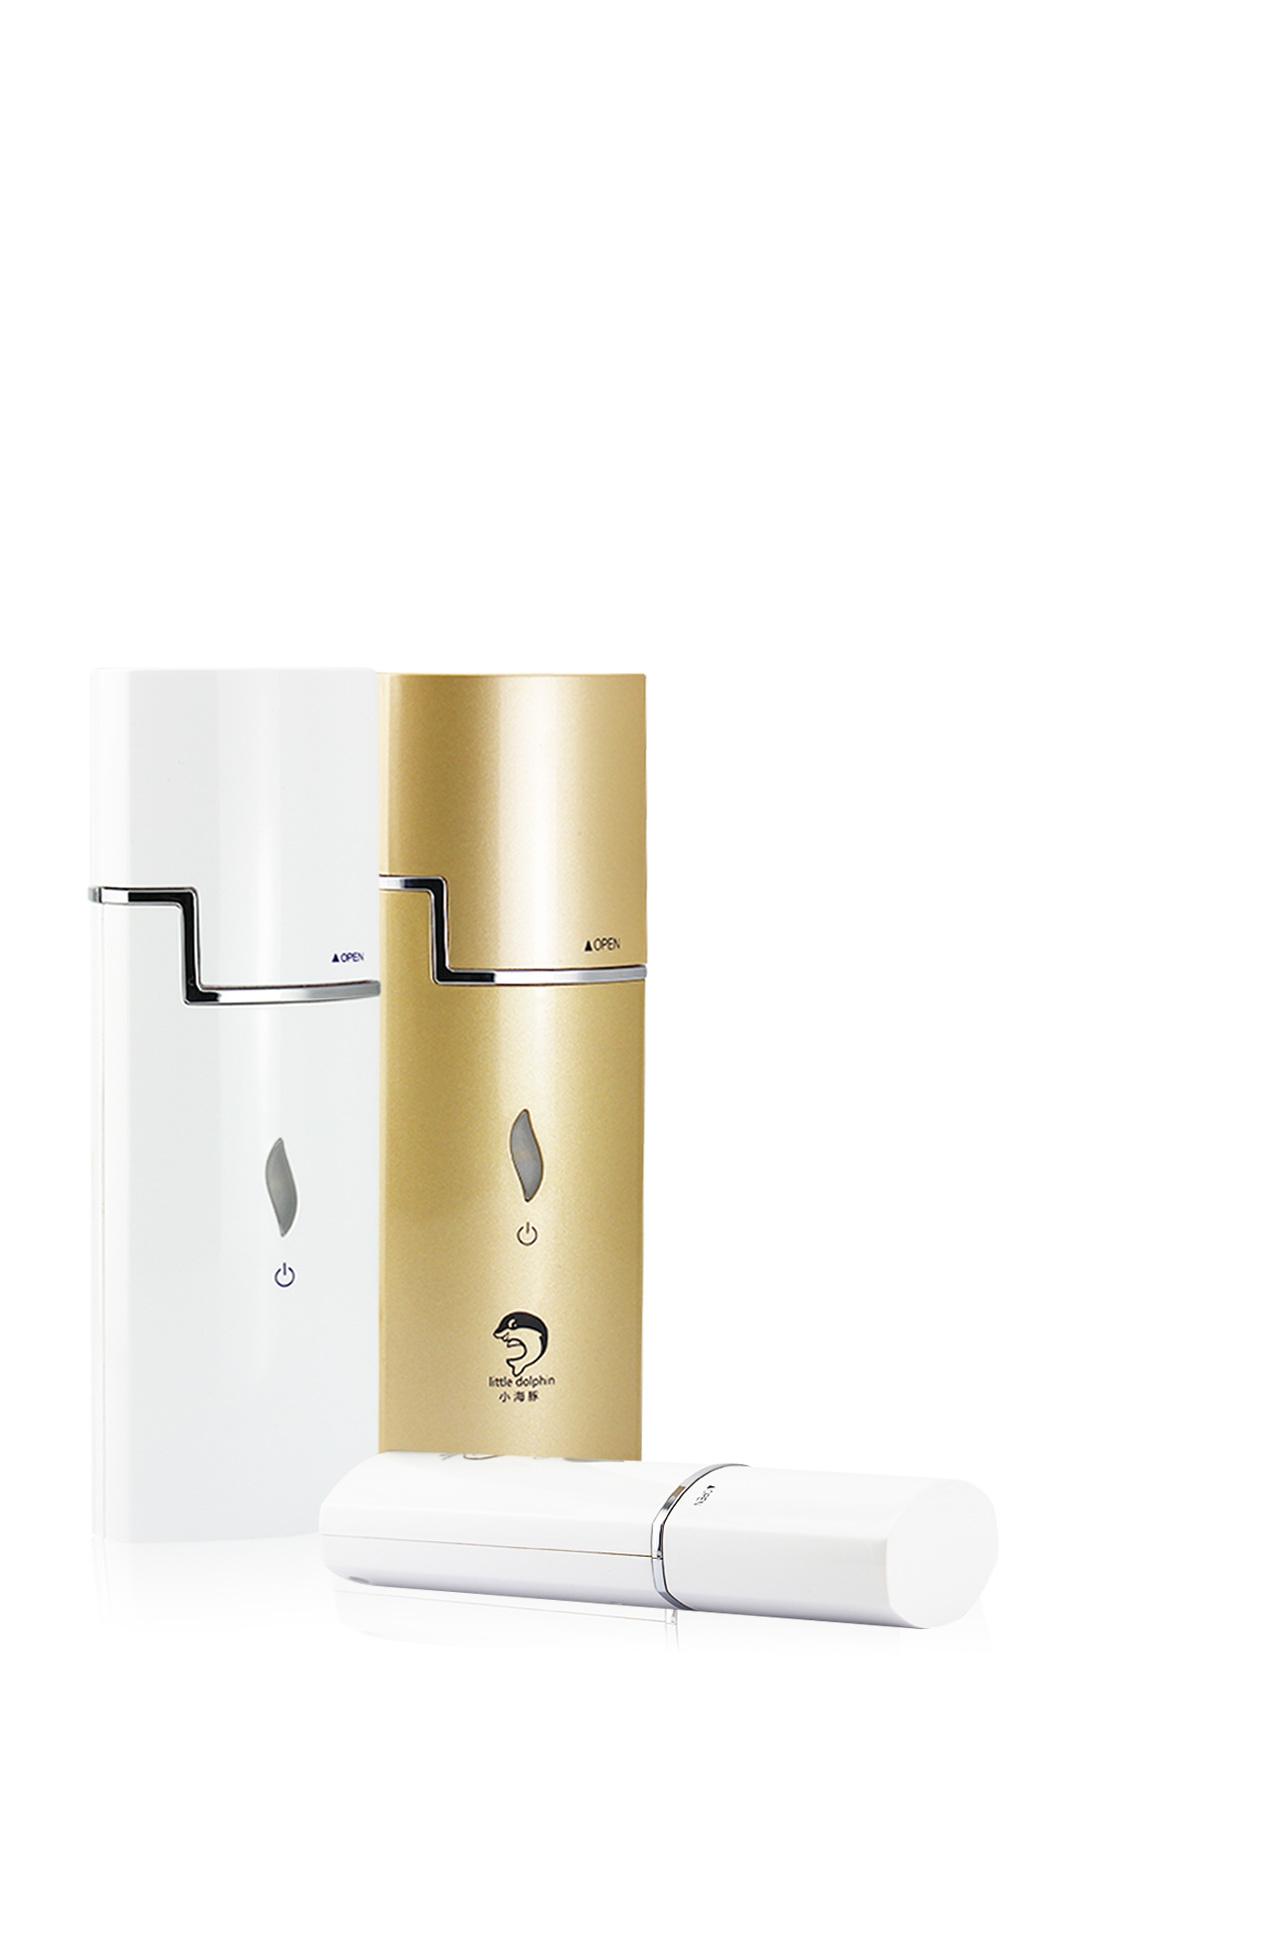 Rechargeable and Portable Nano Mini Facial Steamer Nano Mist Sprayer for Skin Care